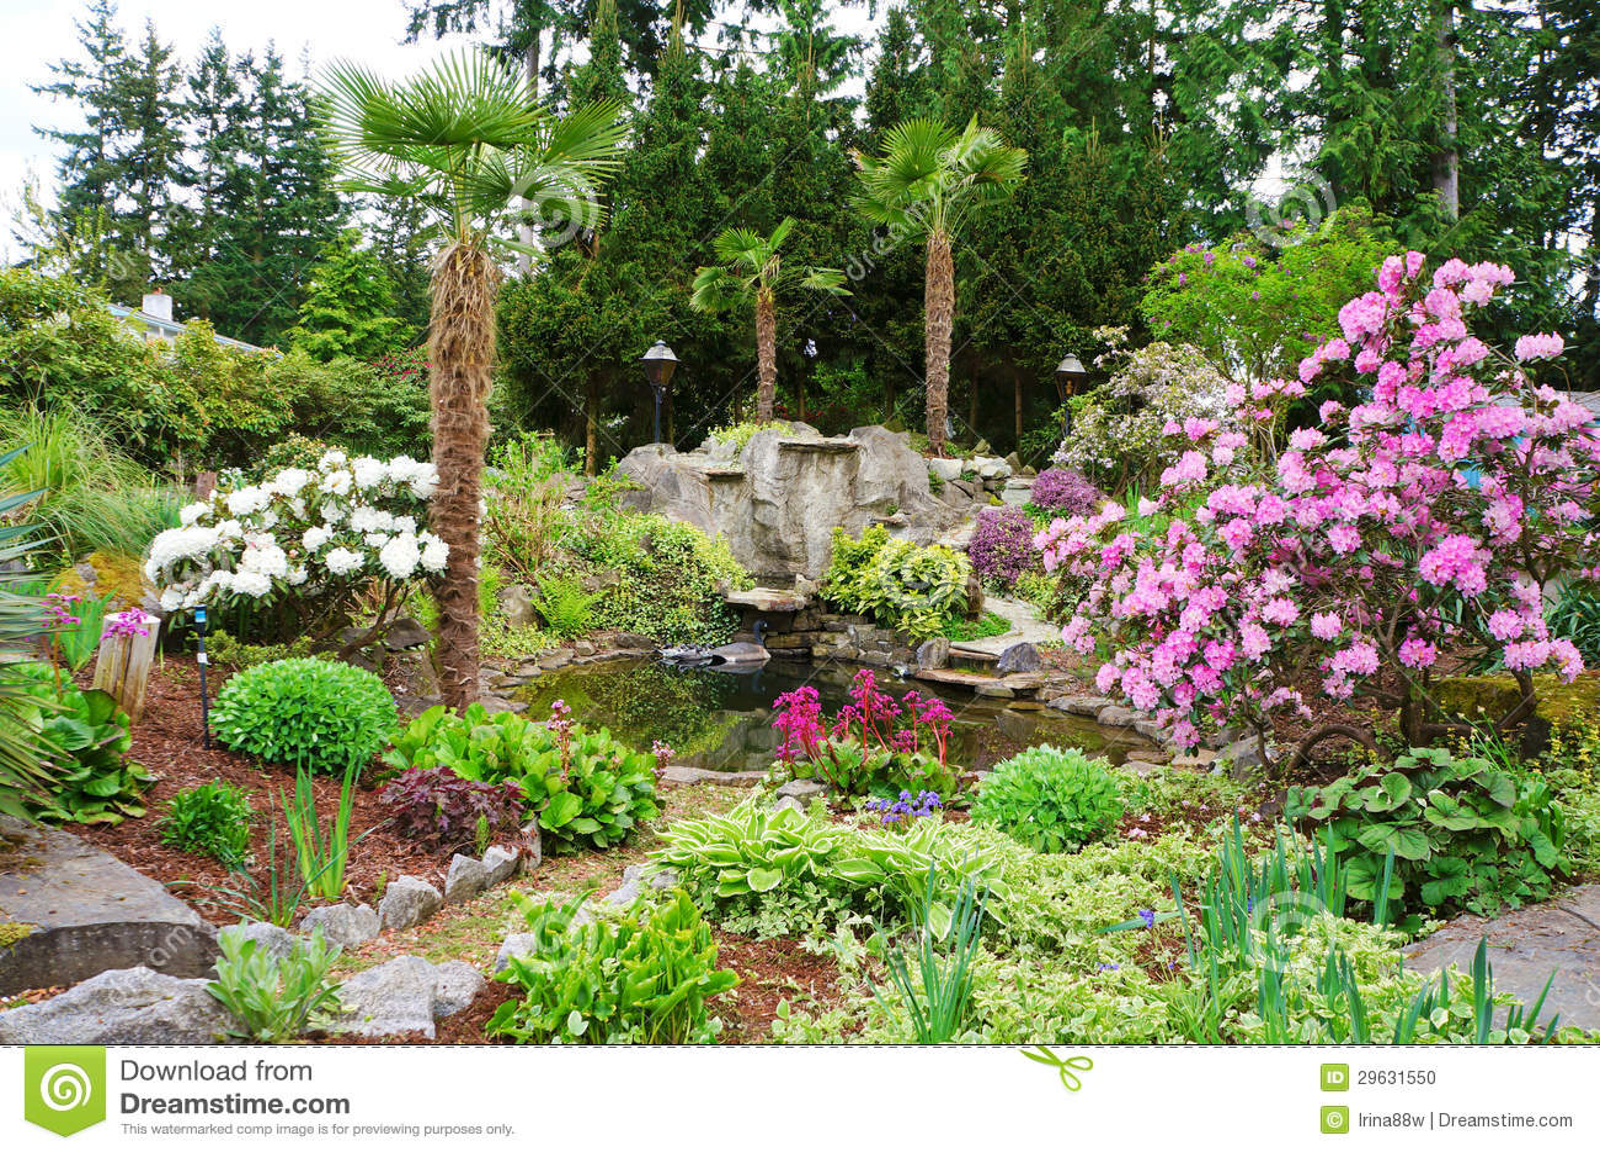 Spring american northwest home landscape garden stock for Landscape my garden